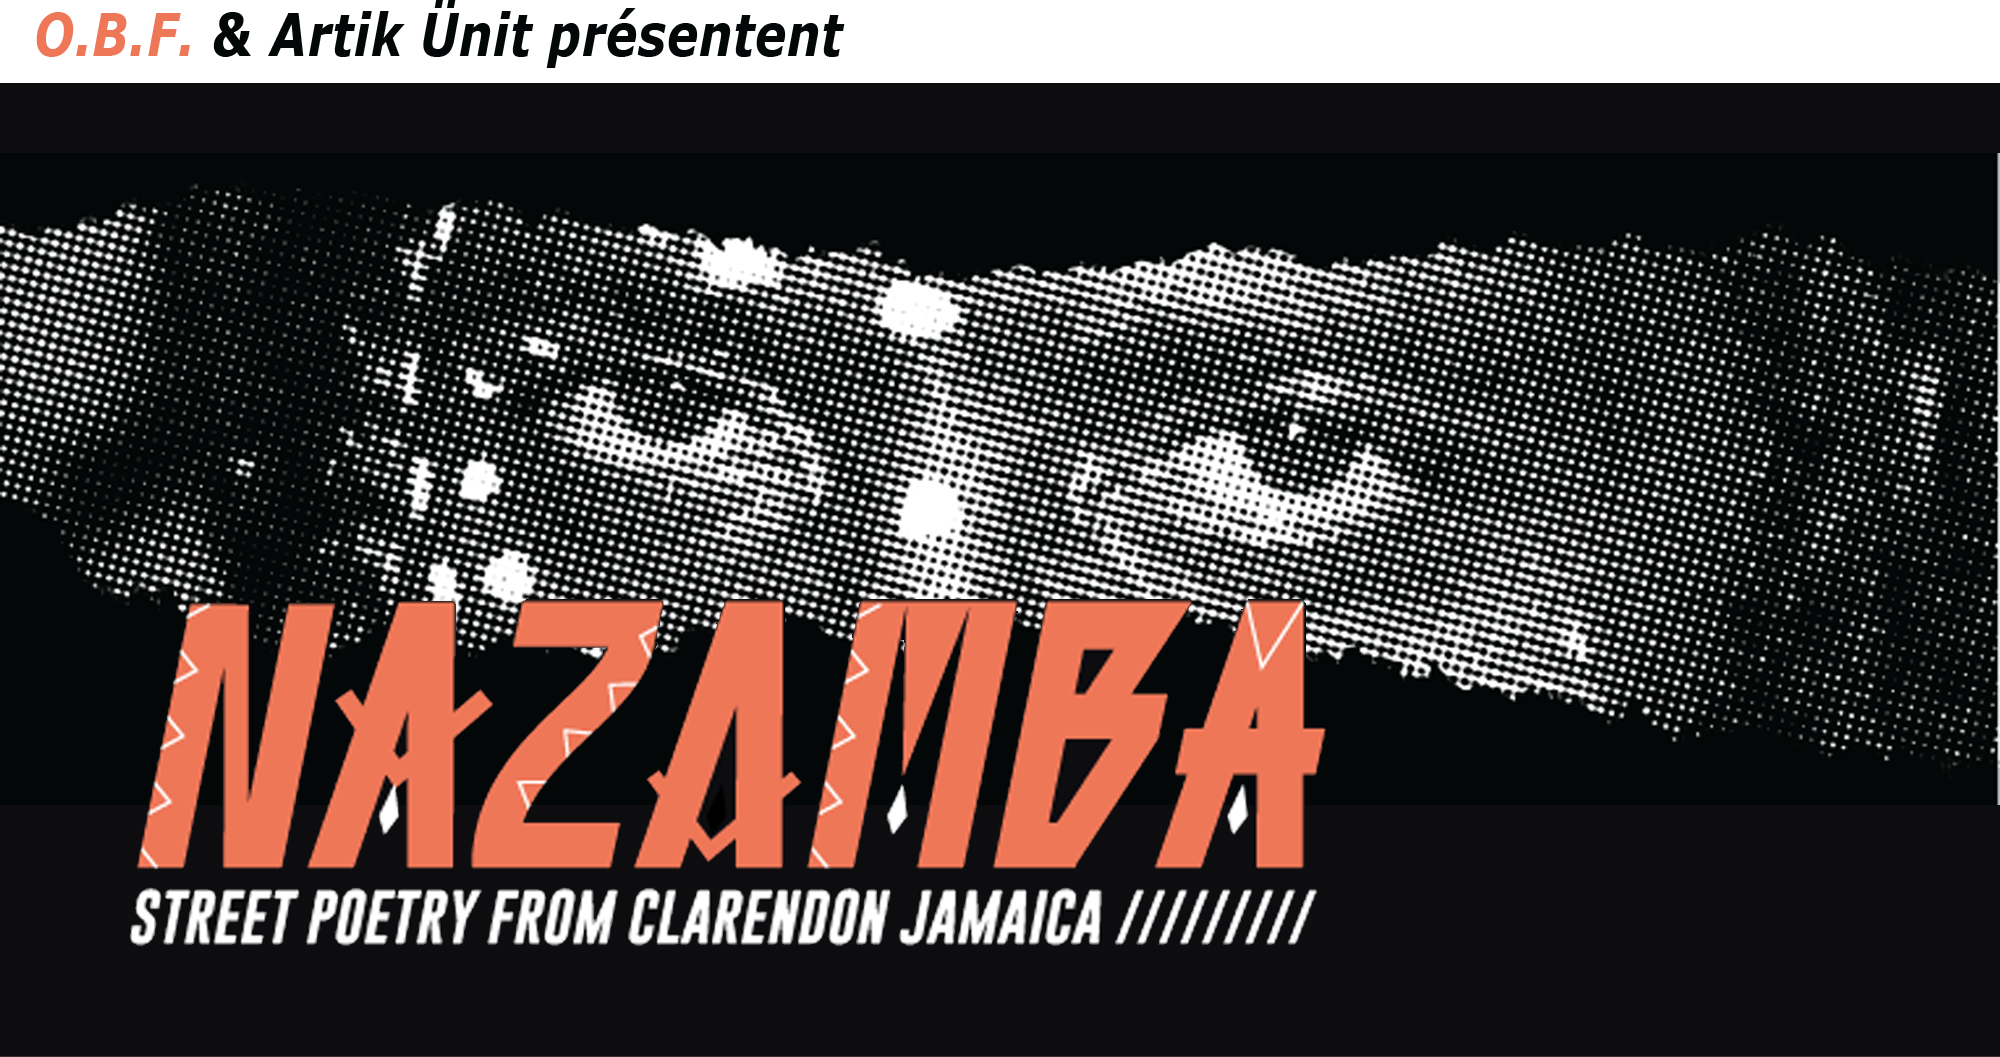 NAZAMBA nouvel album et tournée